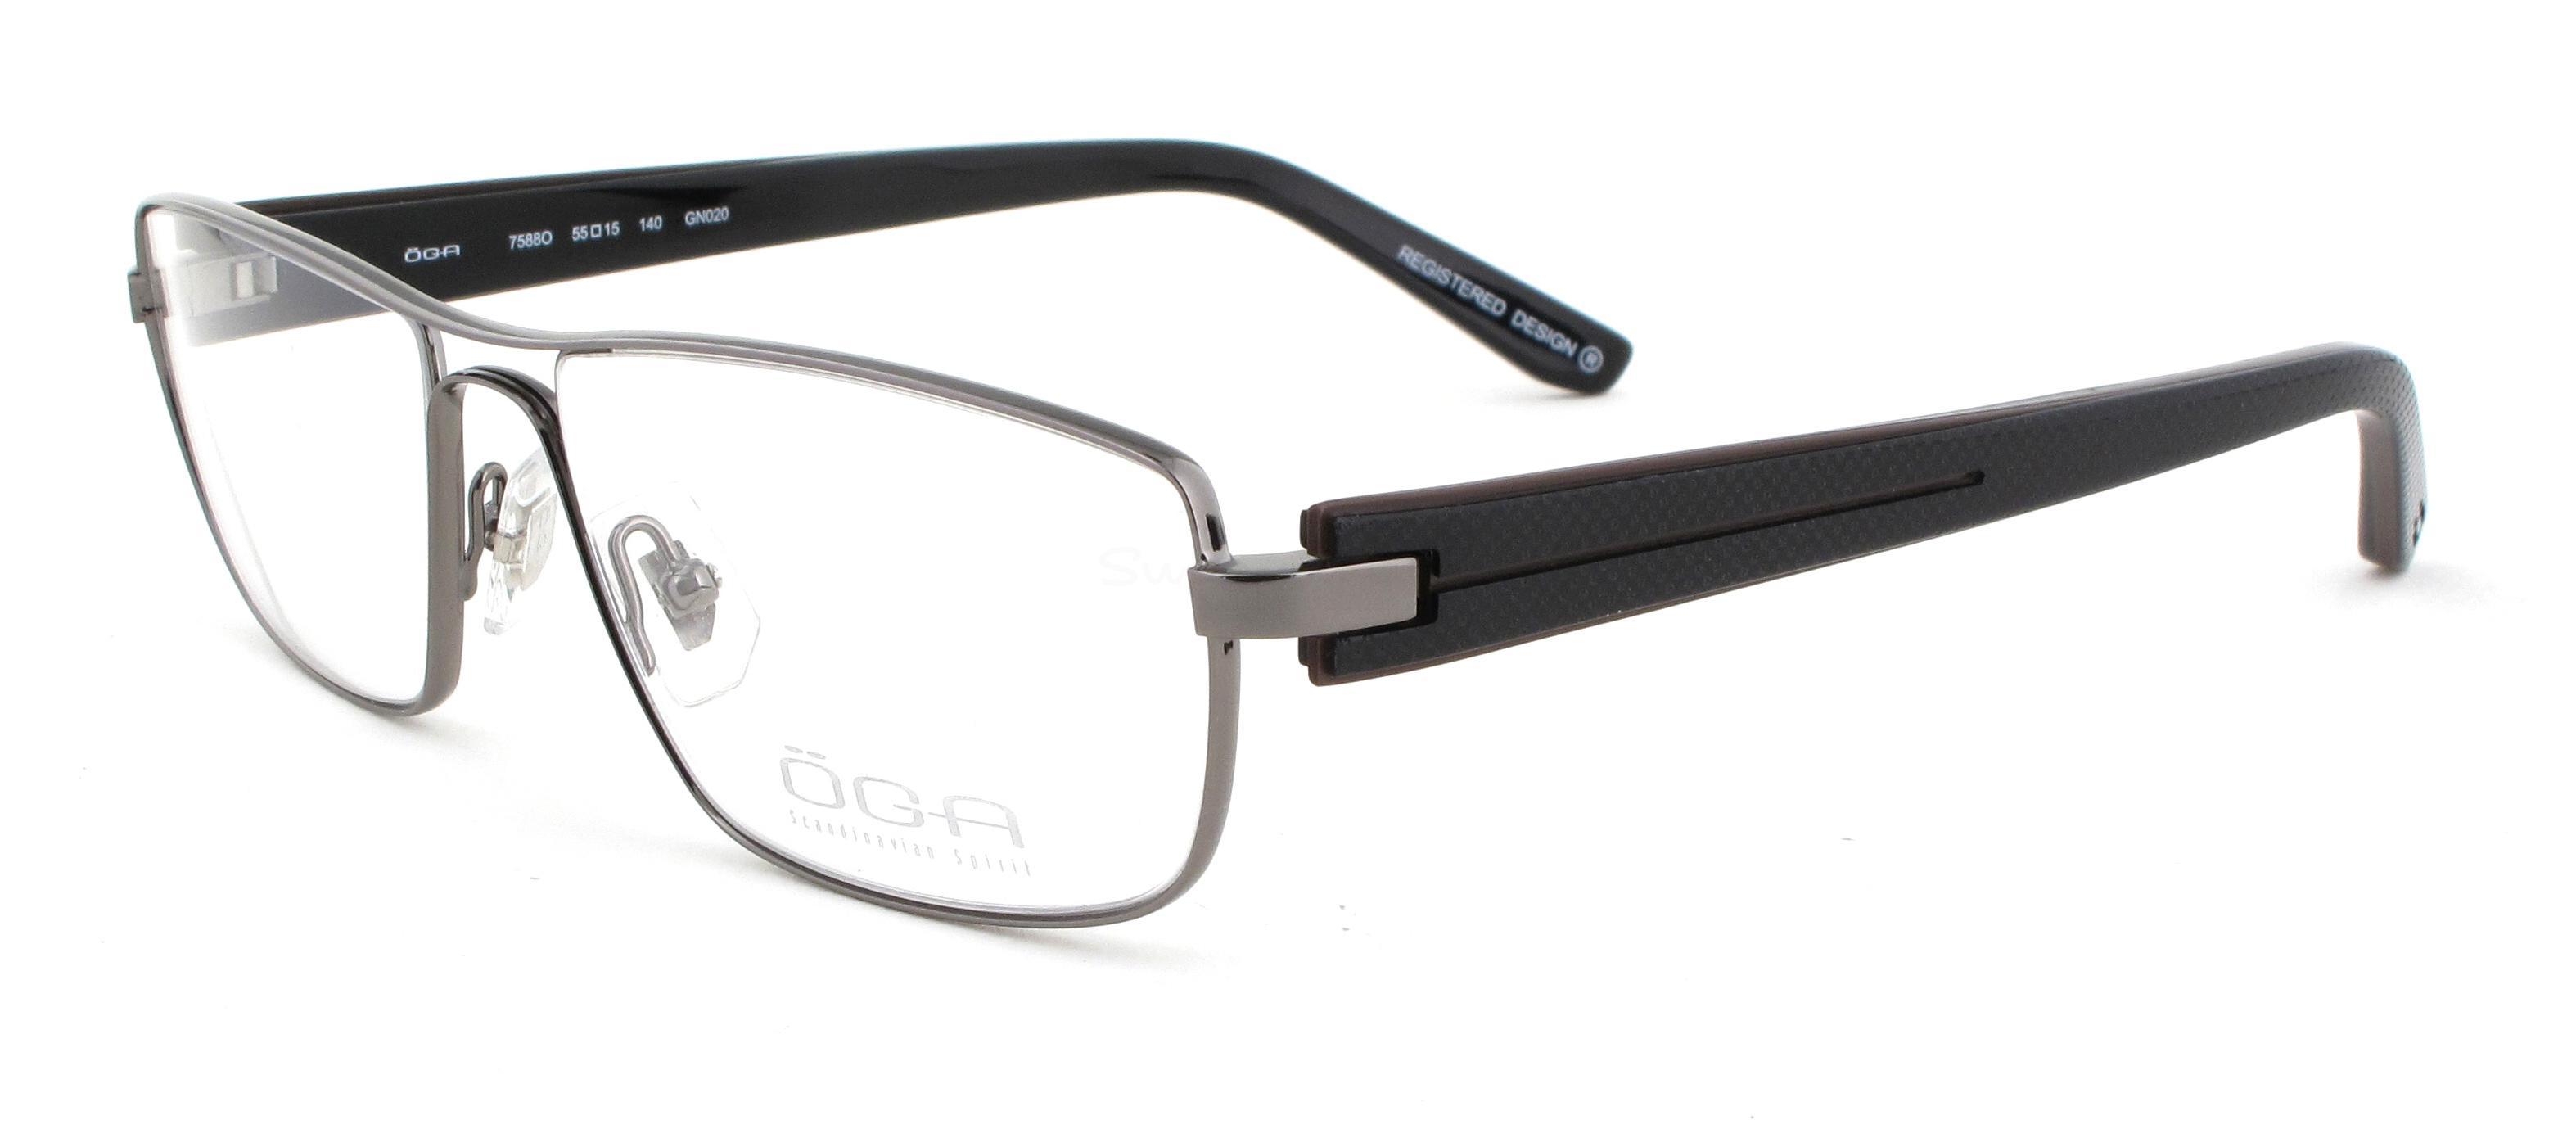 GN020 7588O TALVAC 2 Glasses, ÖGA Scandinavian Spirit